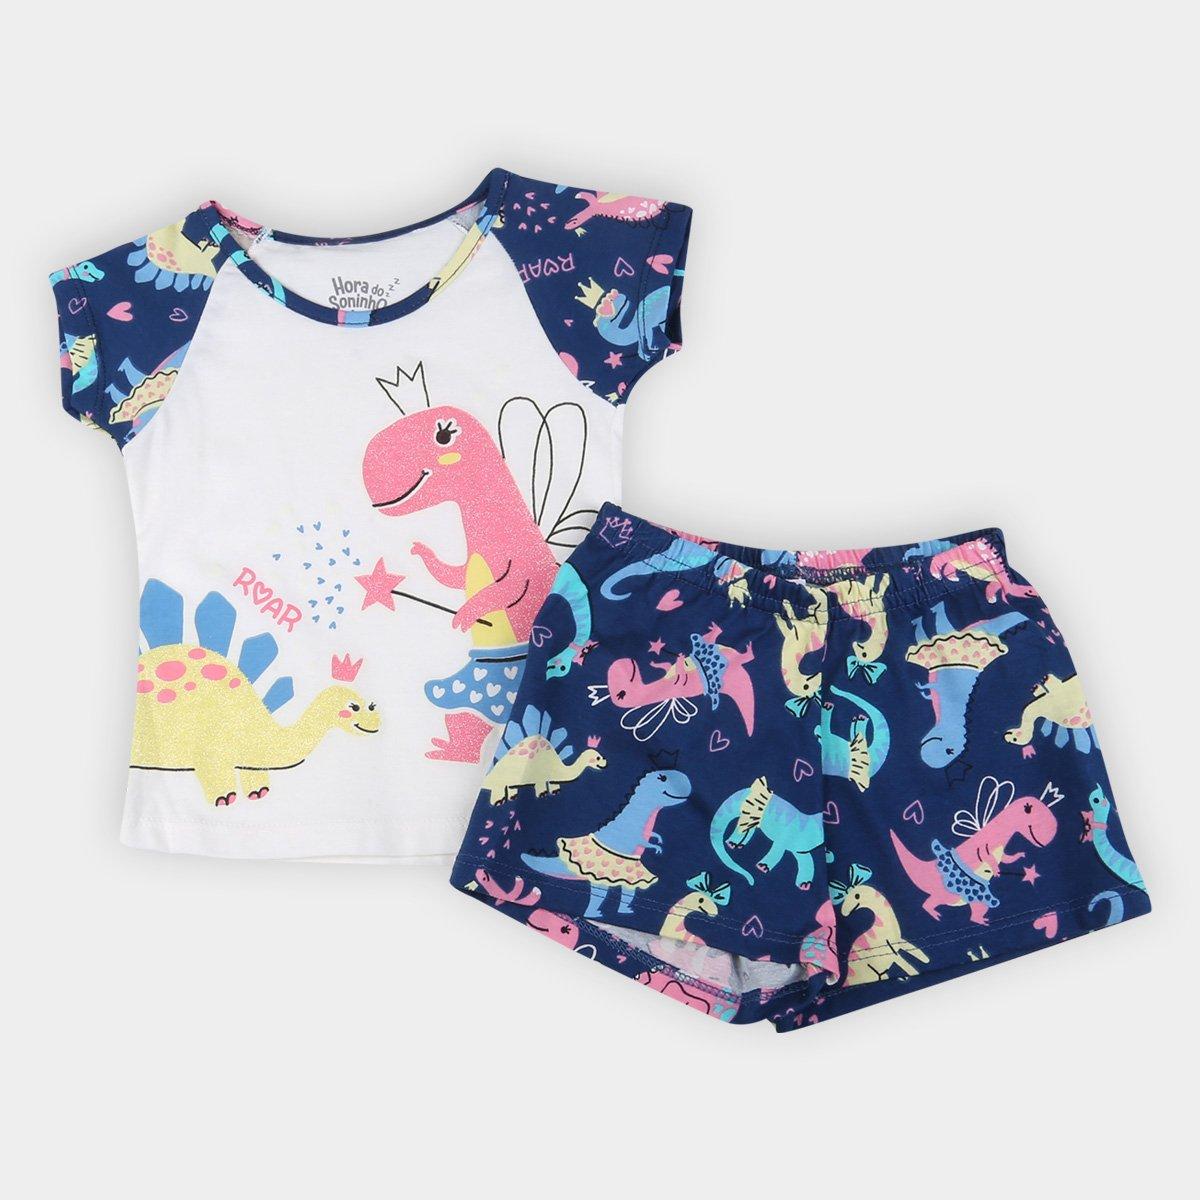 Pijama Curto Bebê Elian Dino Princesa Brilha no Escuro Feminino